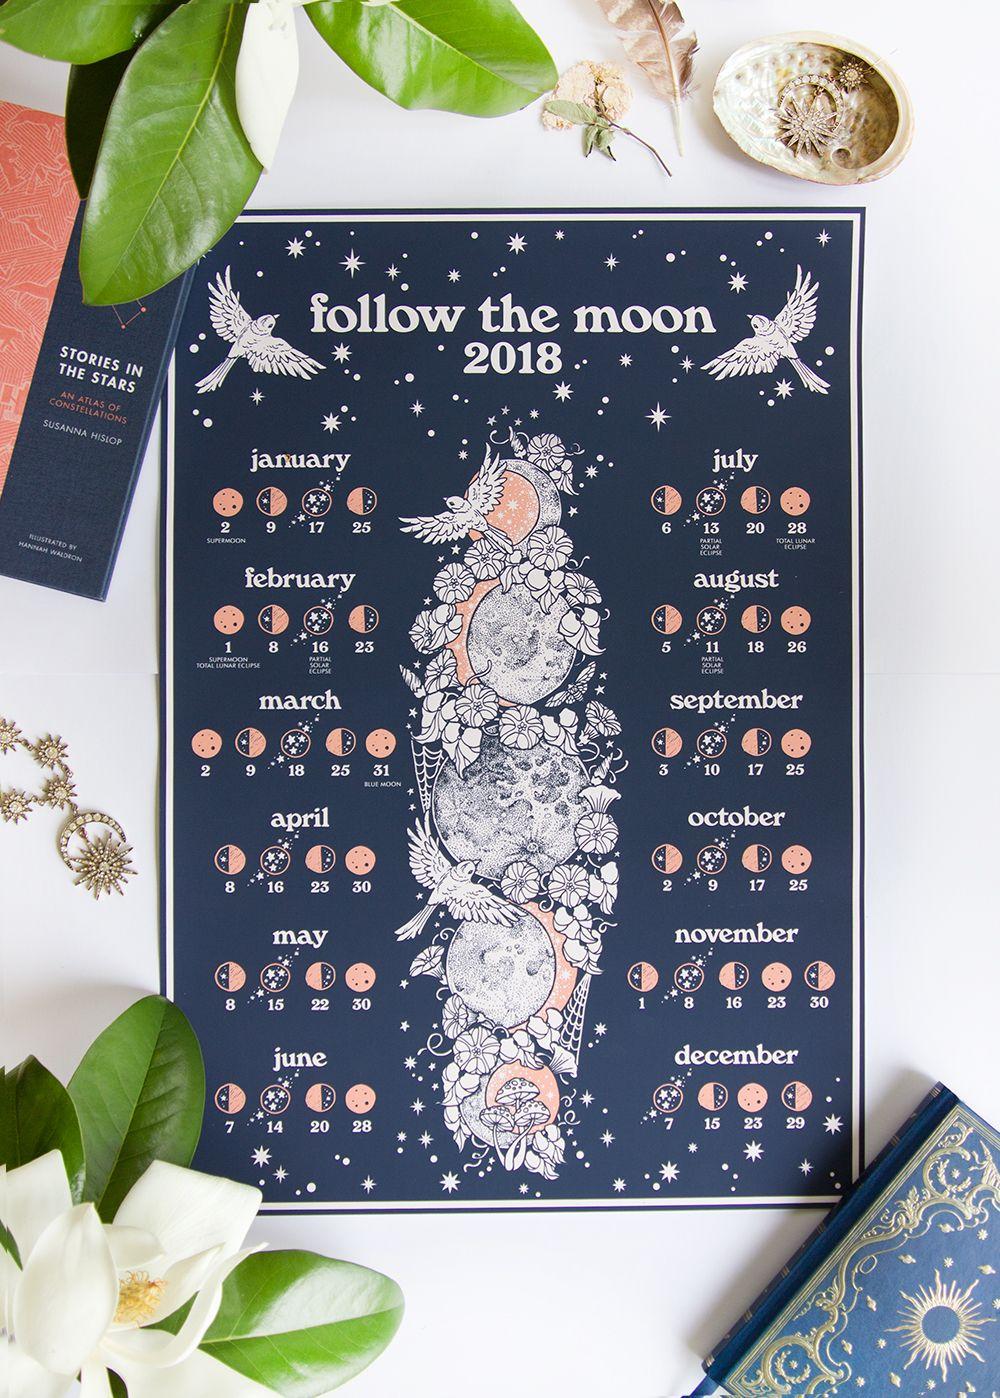 Follow The Moon 2018 Lunar Calendar By Raychponygold Aus Nz